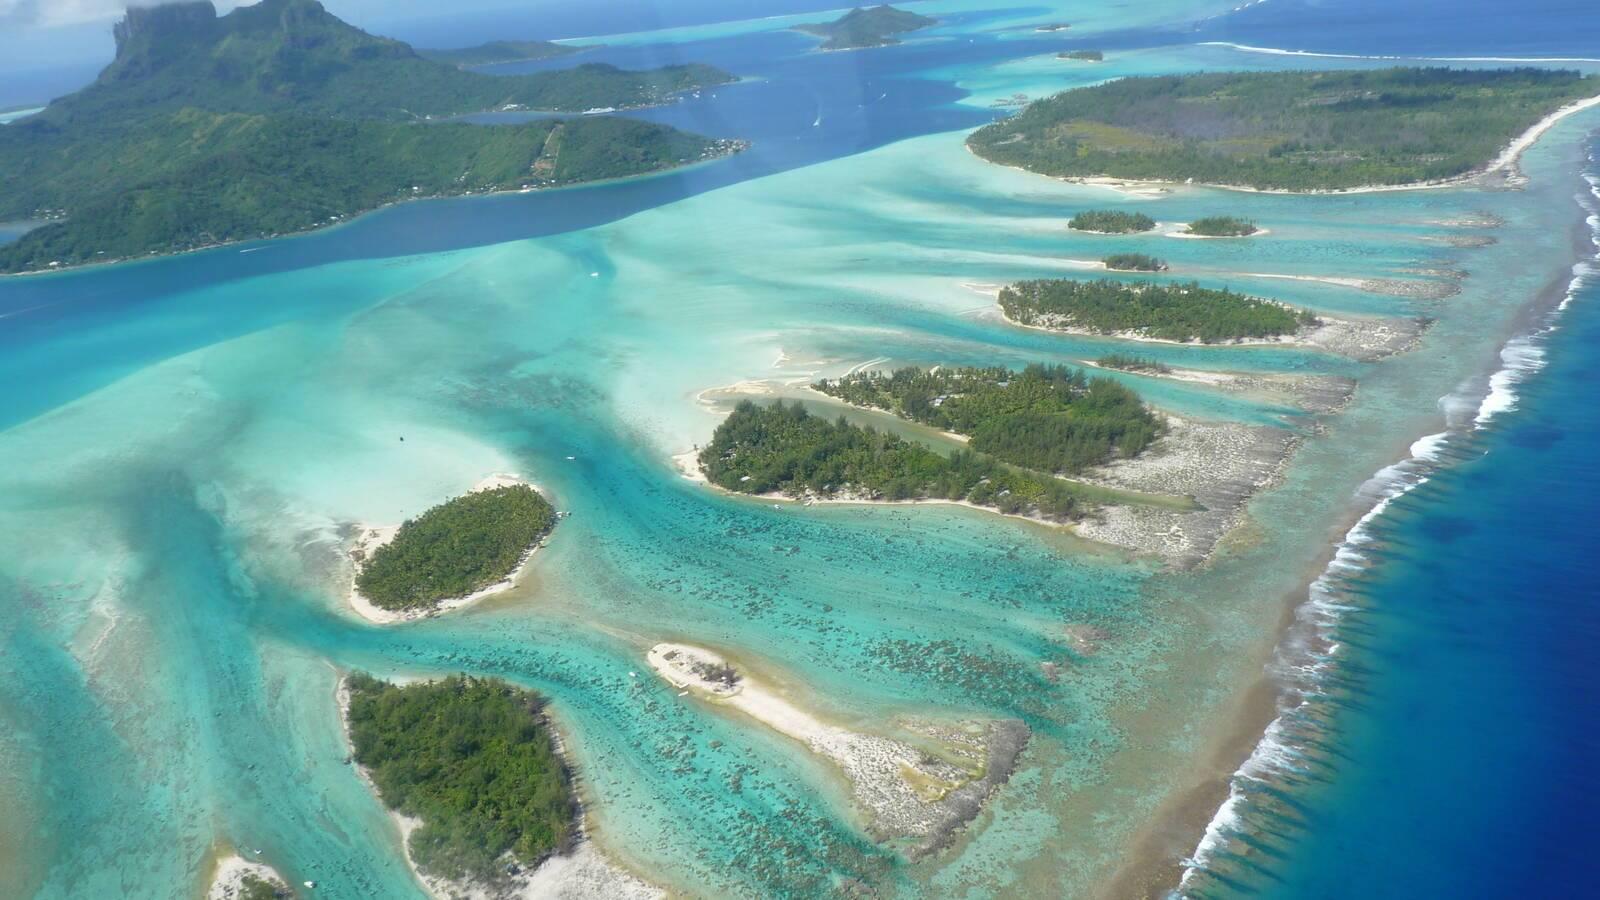 Bora Bora Vue Aerienne Ile Ocean Polynesie Francaise